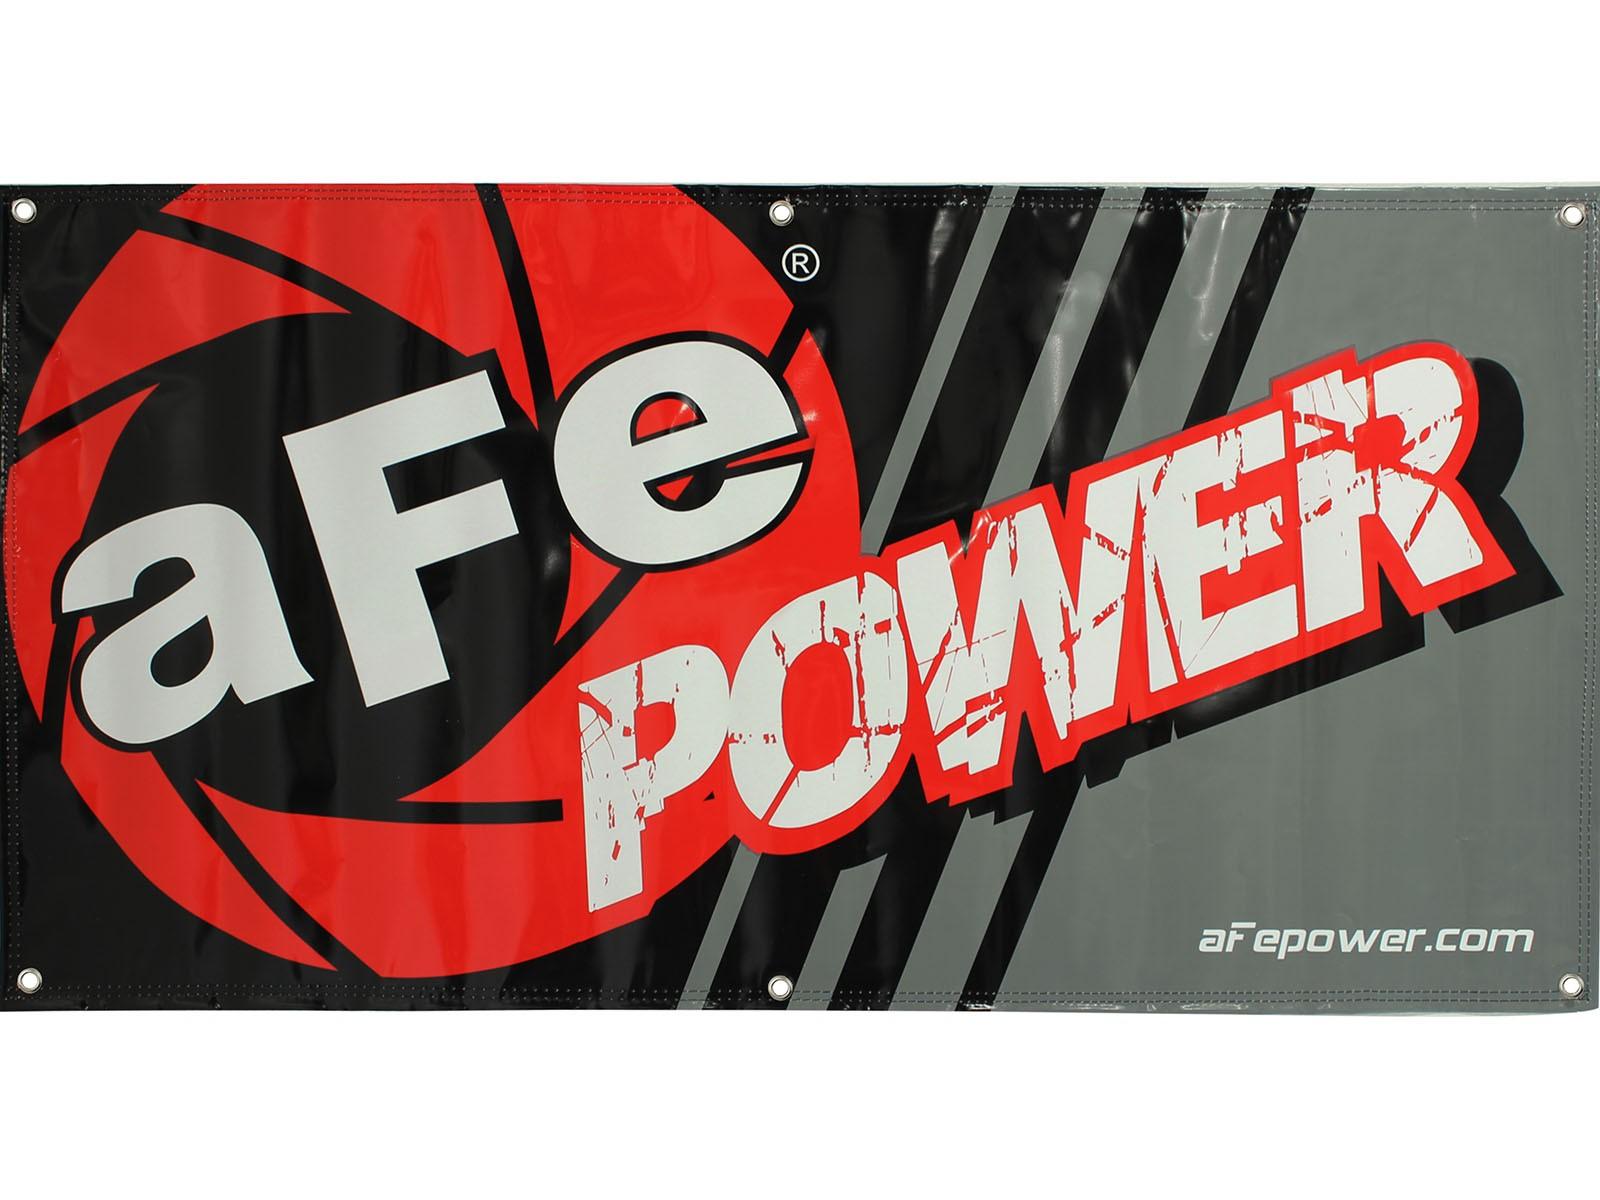 Afe Power 40 10038 Banner 3 X 8 Ft Afe Power Afe Power